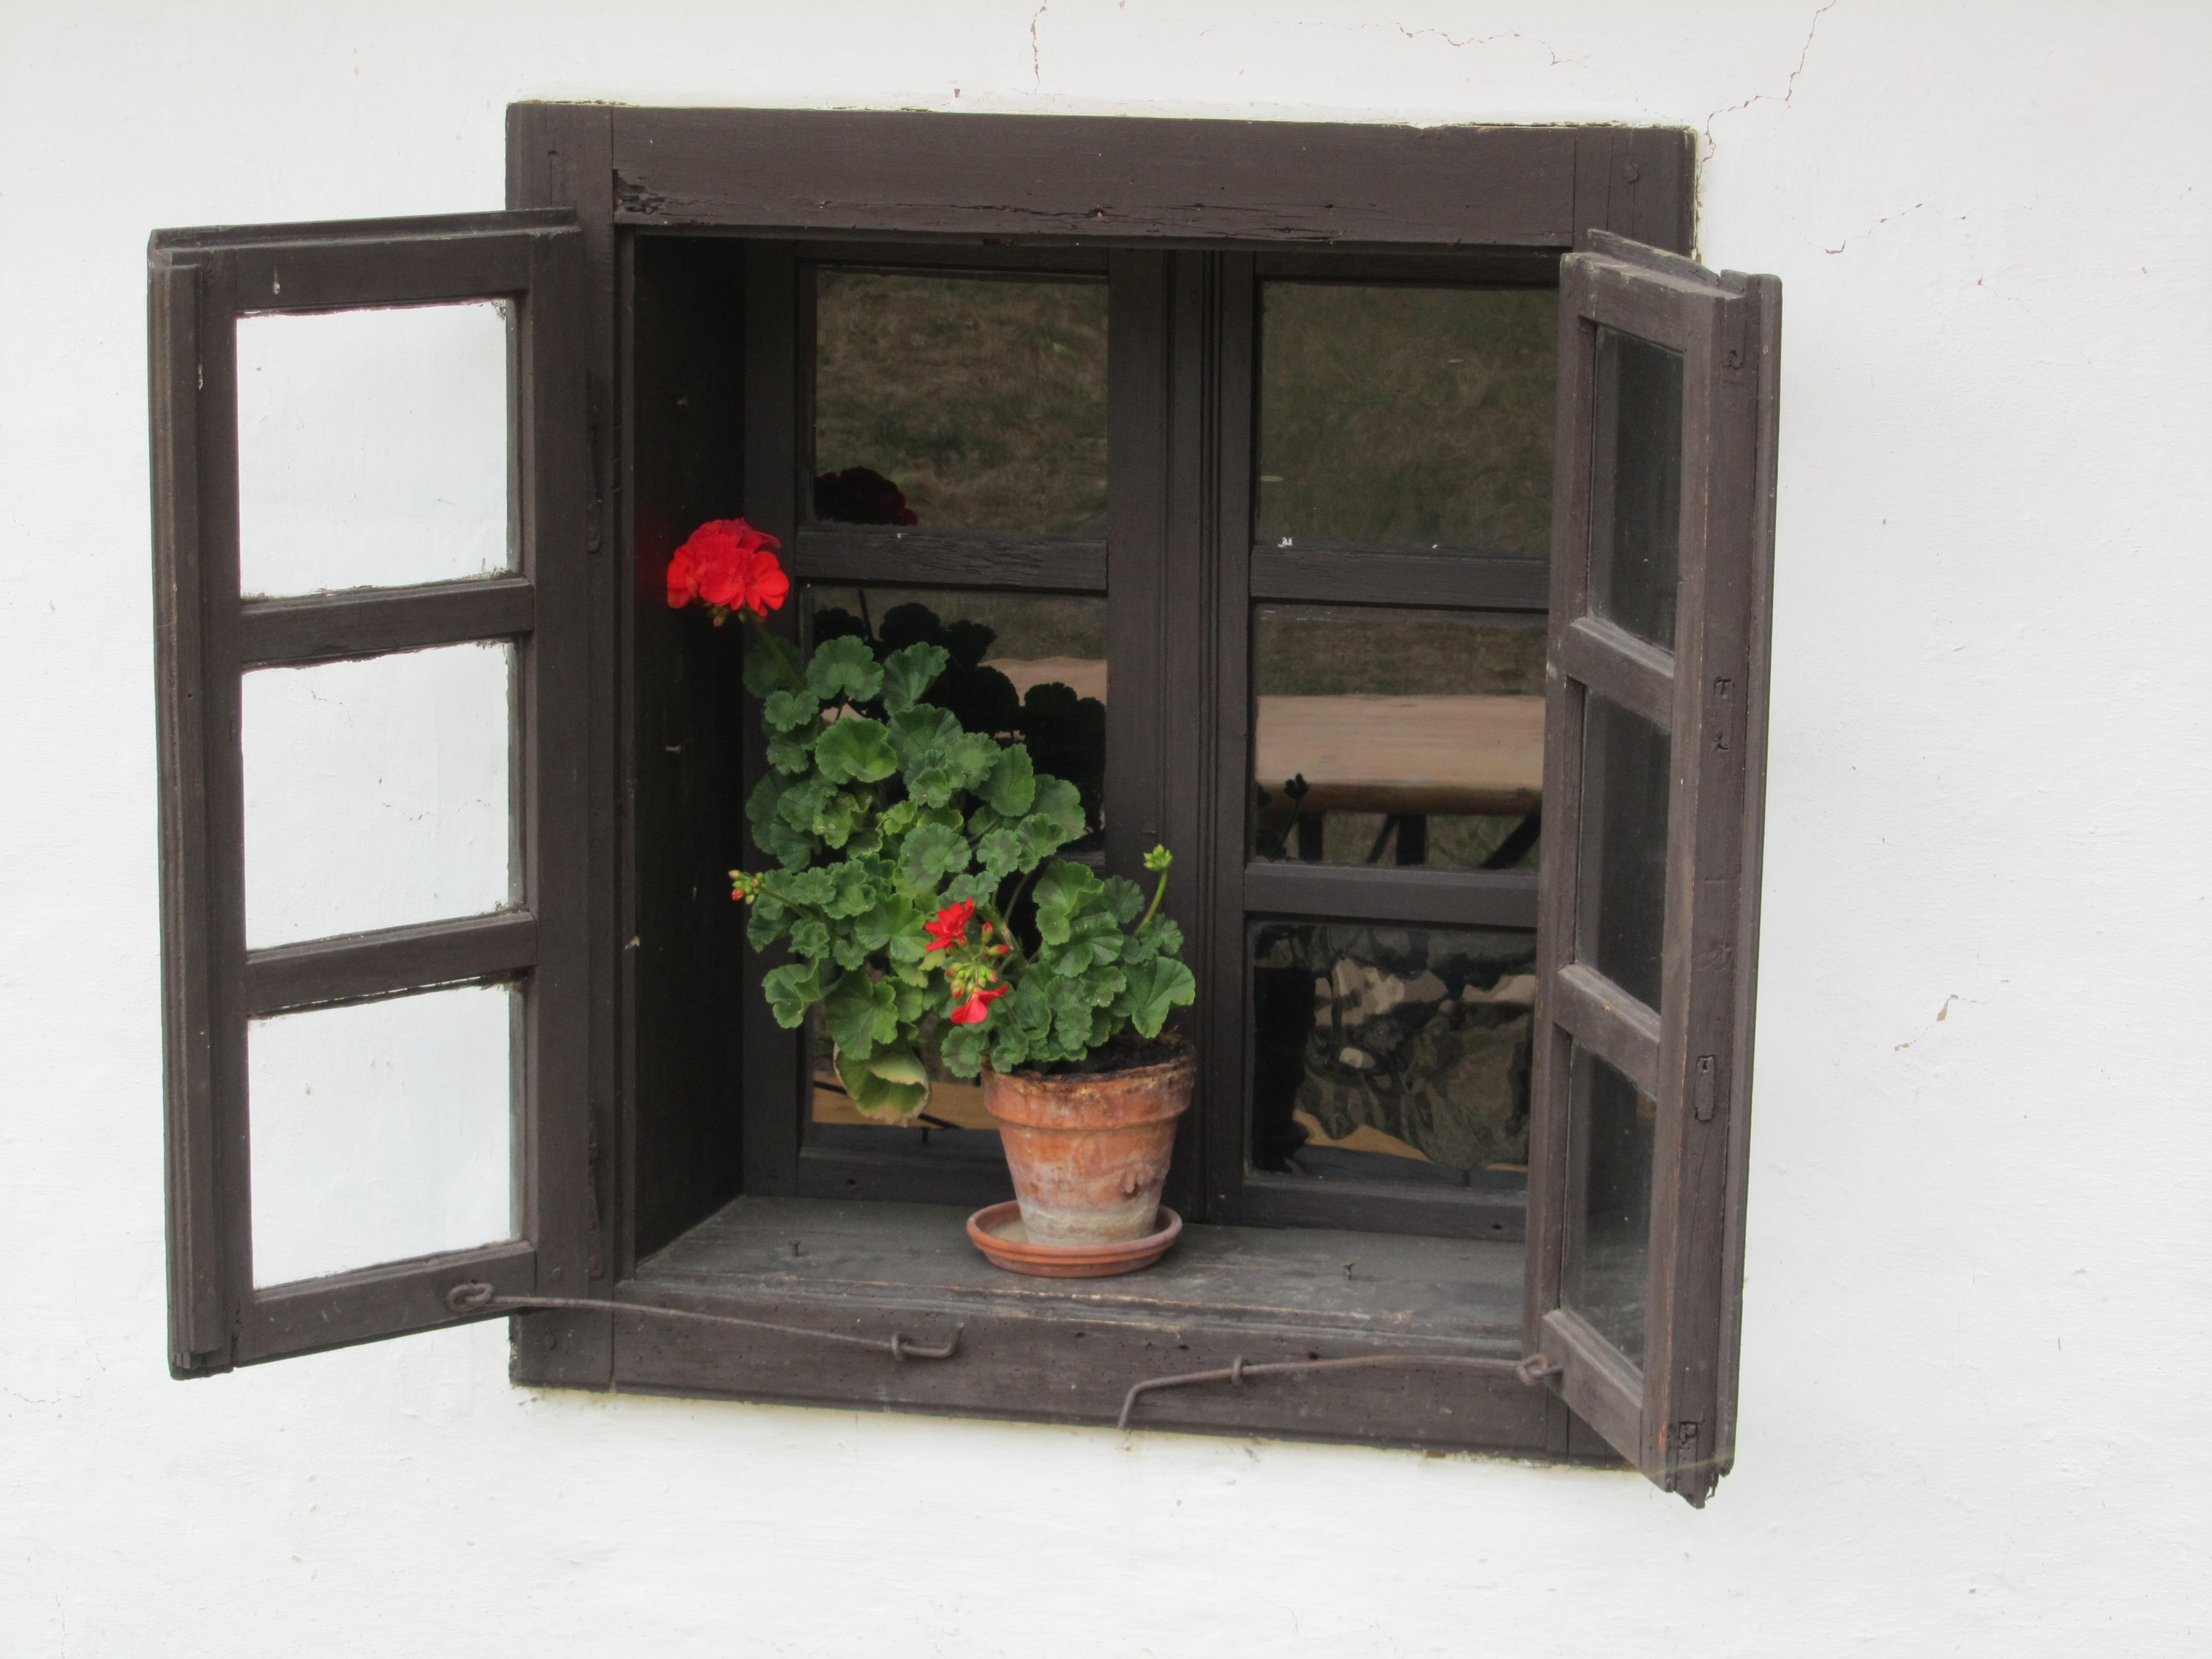 Kostenlose foto : Tabelle, Holz, Fenster, Blumen-, Regal, Möbel ...